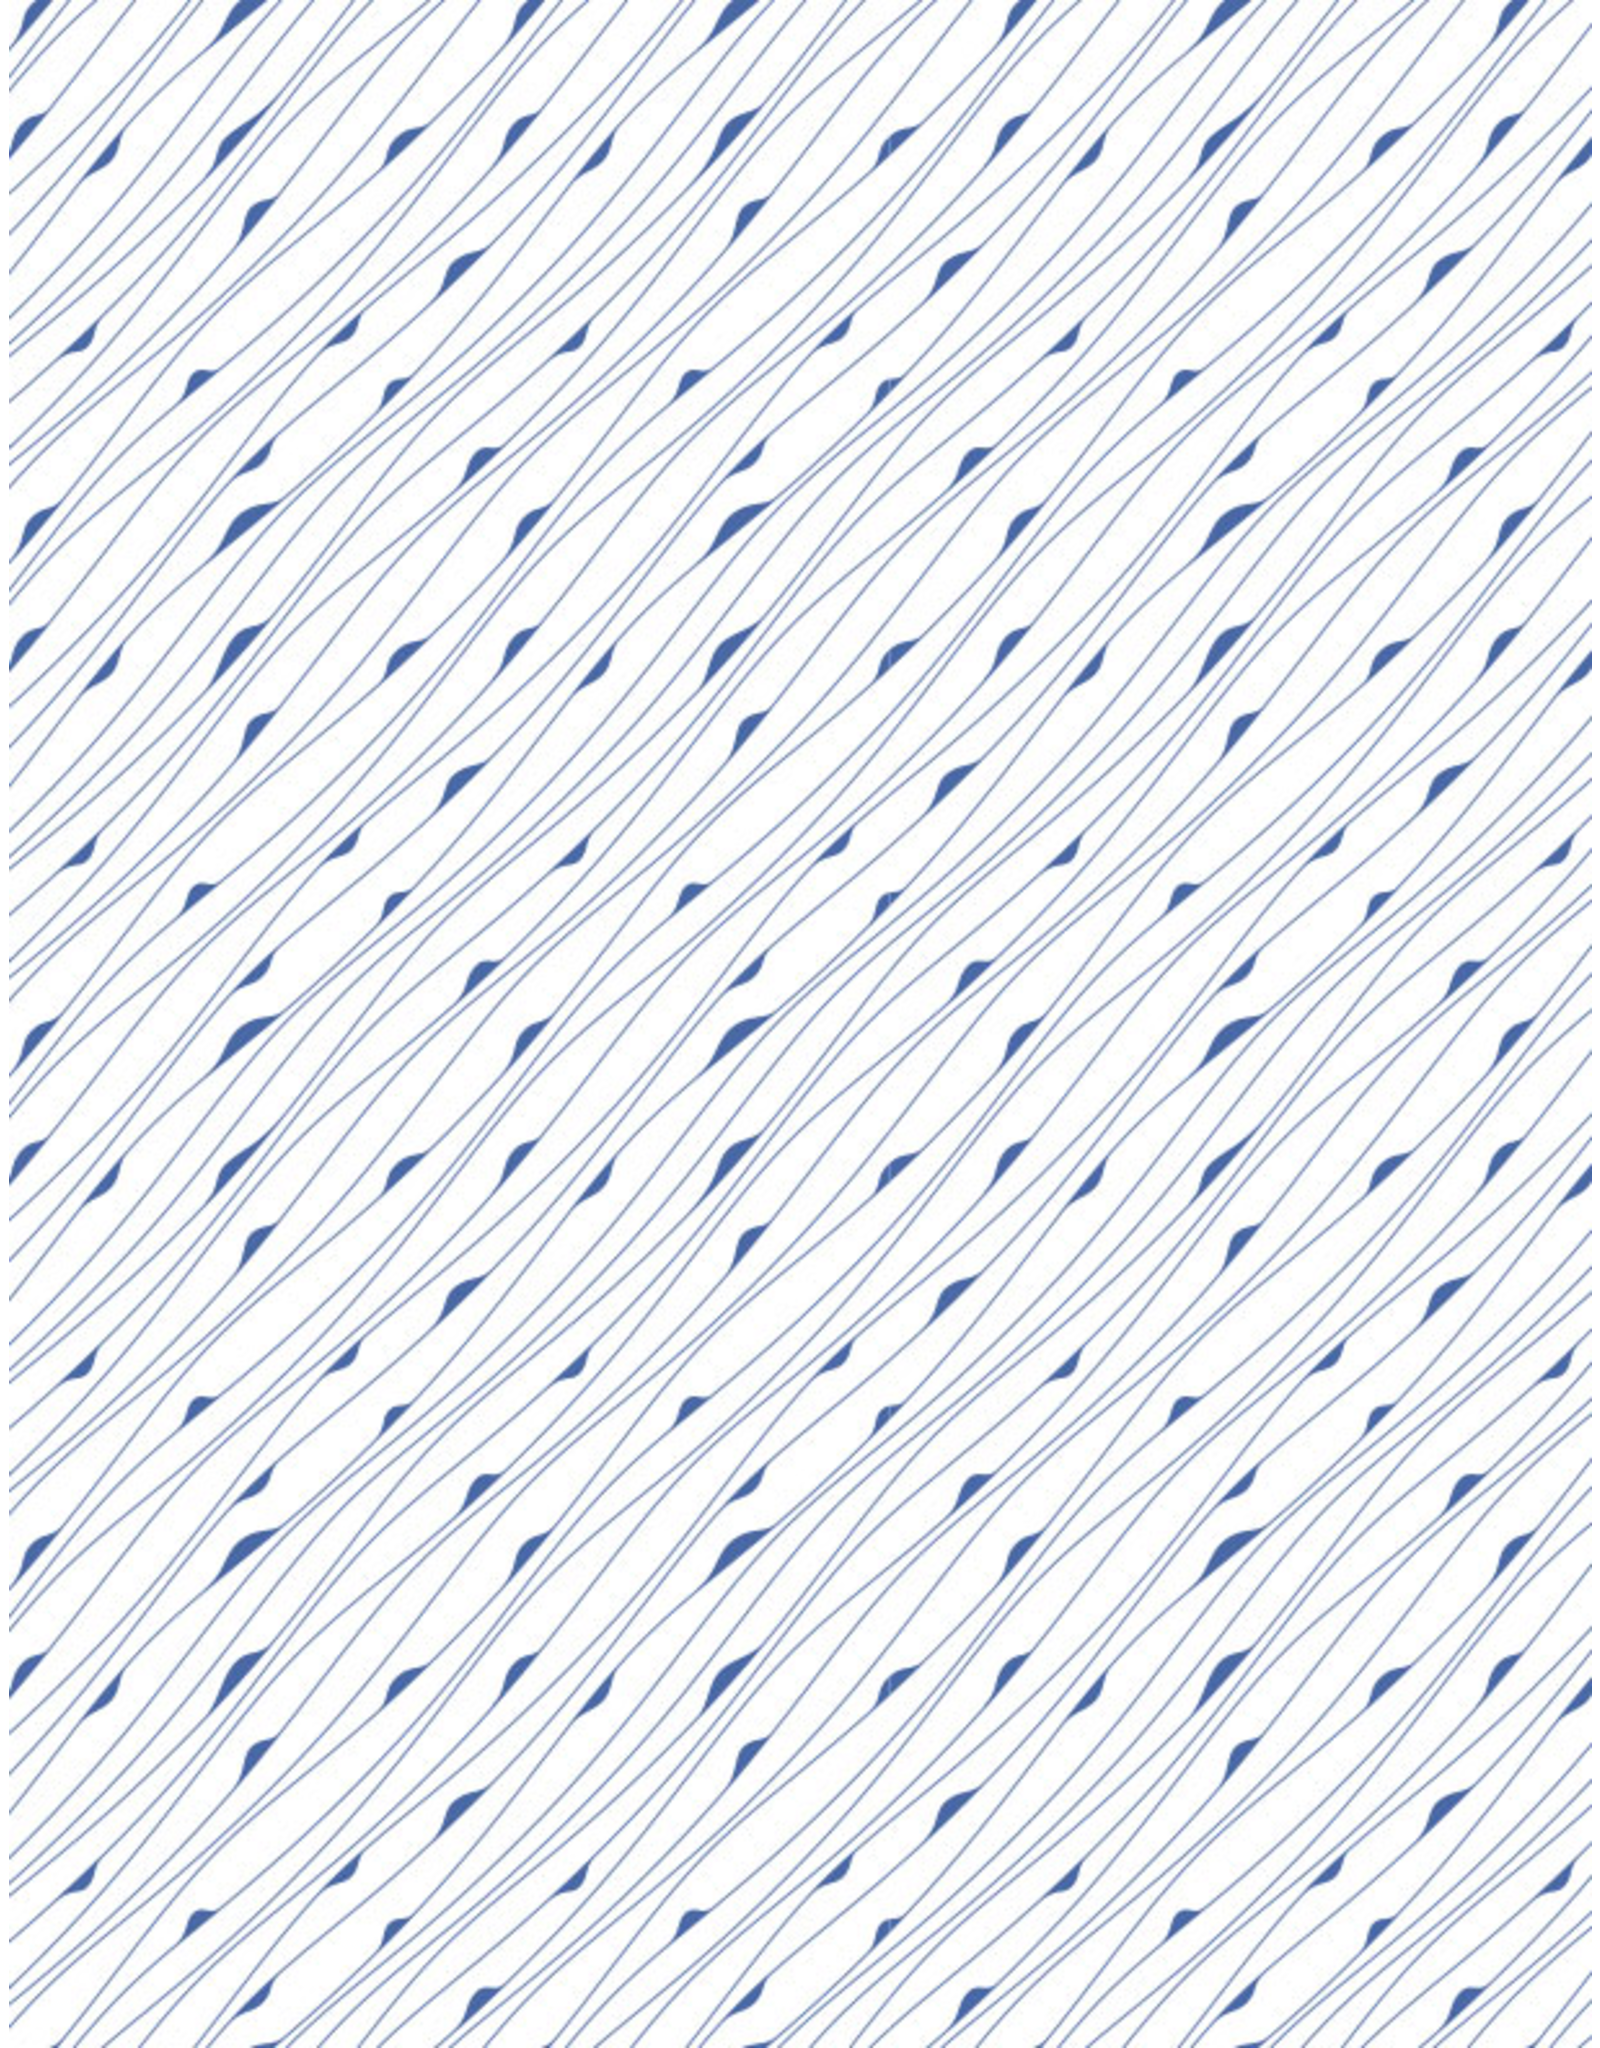 Sanbao Pattern decal – Reeds (underglaze decal - 16cm x 22cm)